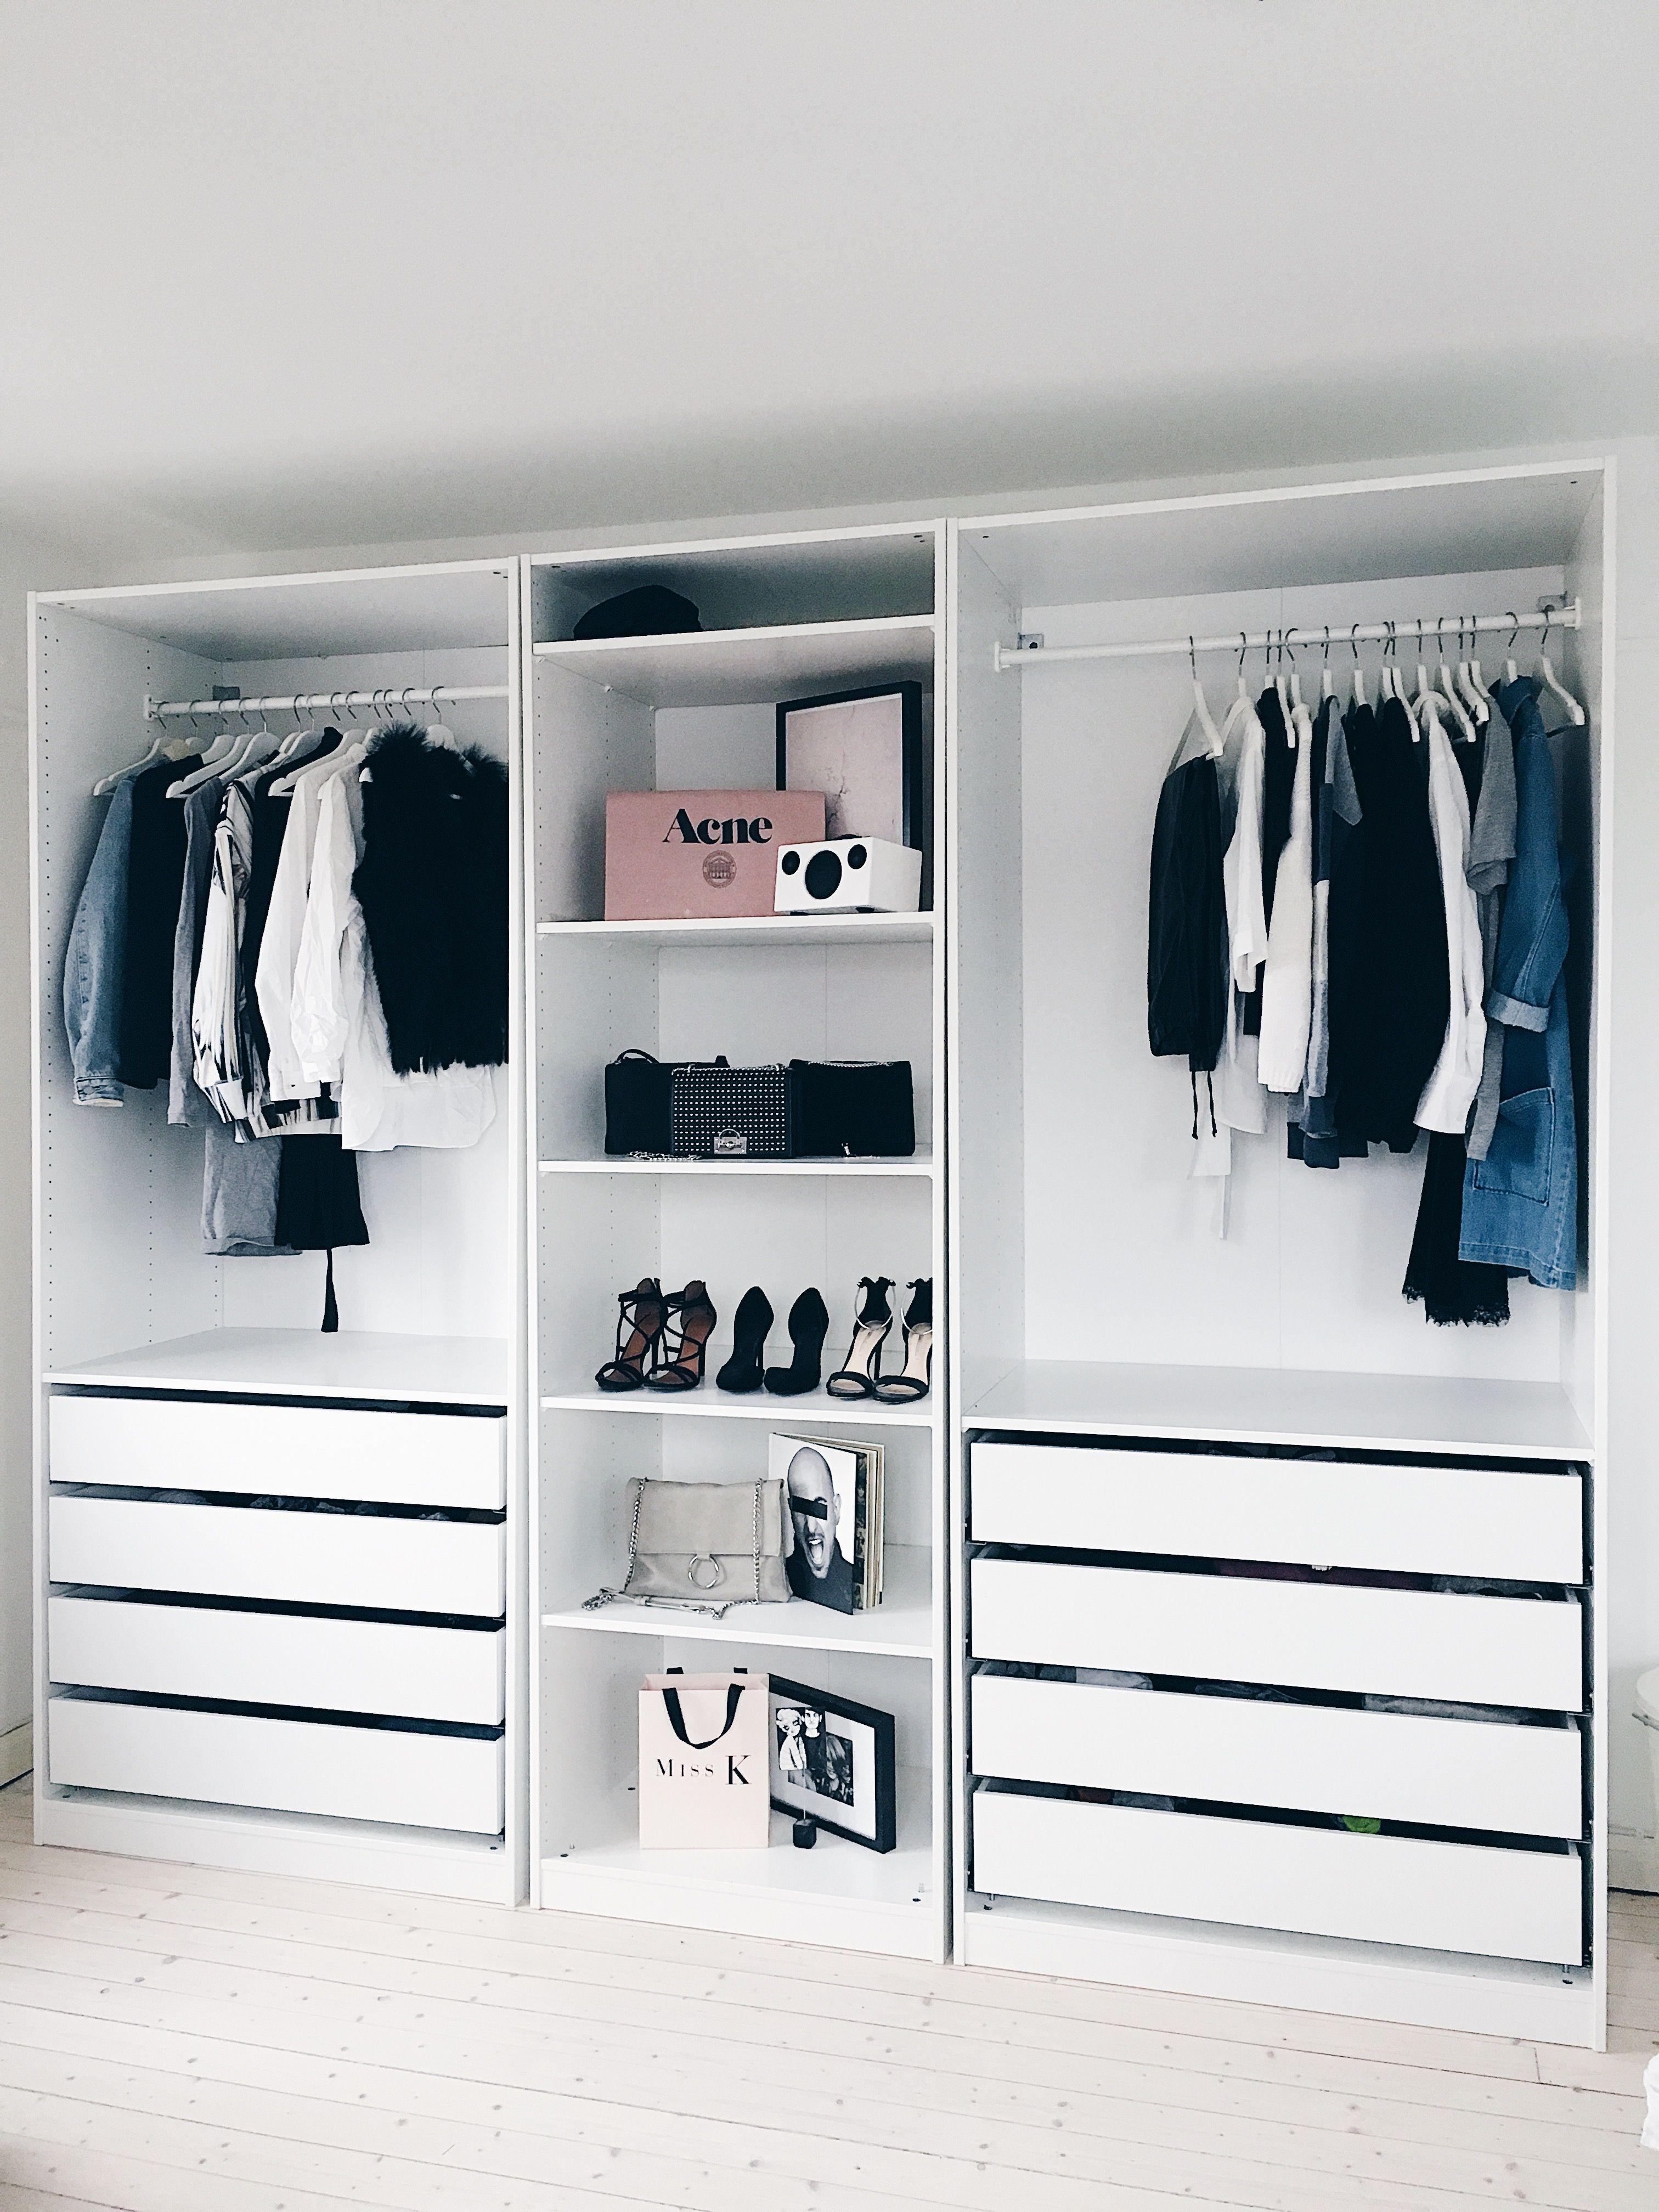 Katerinekosivchenko Diy Clothes Organization Closet Bedroom Closet Design Closet Designs